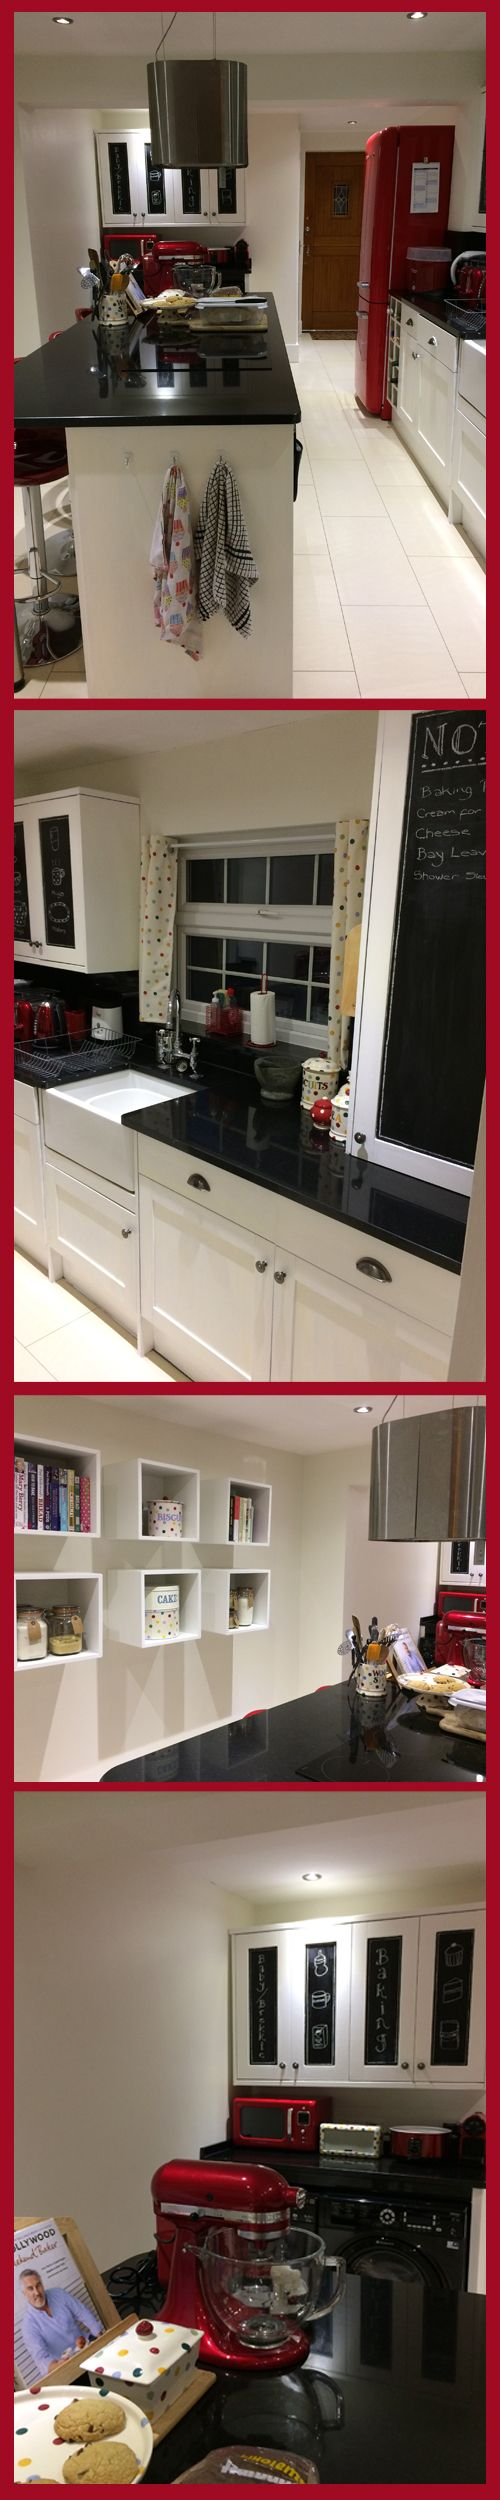 Red, Black & White Kitchen. Emma Bridgewater Polka Dot Accessories